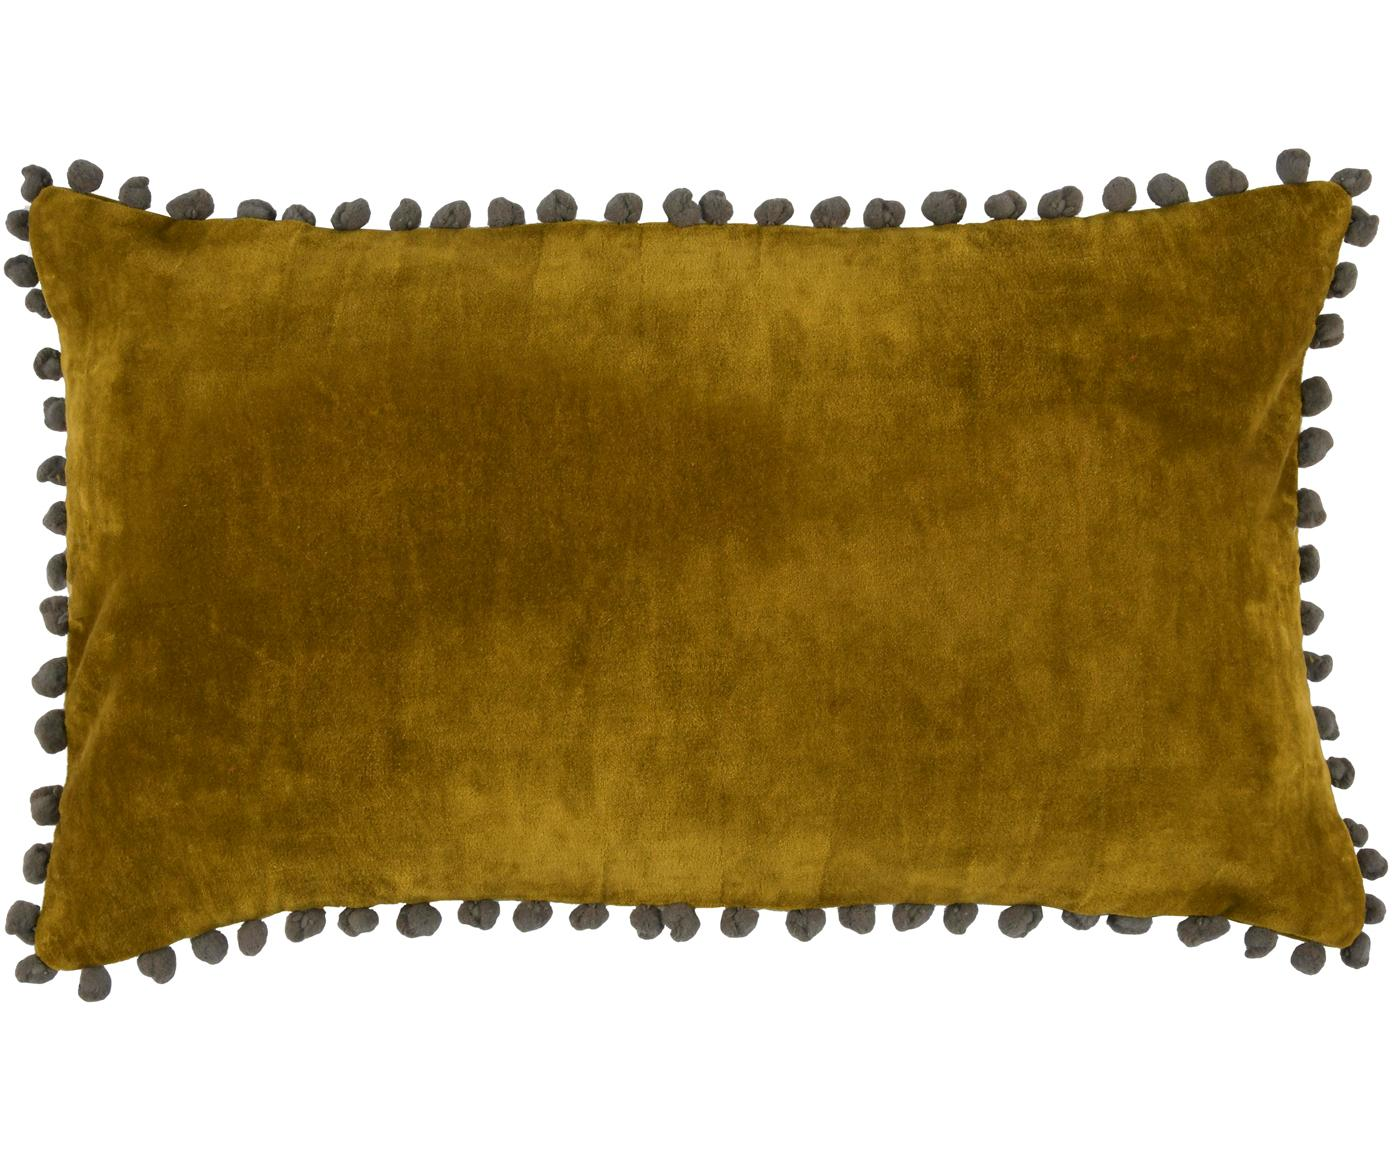 Samt-Kissenhülle Avoriaz in Dunkelgelb mit Bommeln, 70% Polyestersamt, 30% Acryl, Senfgelb, Grau, 30 x 50 cm